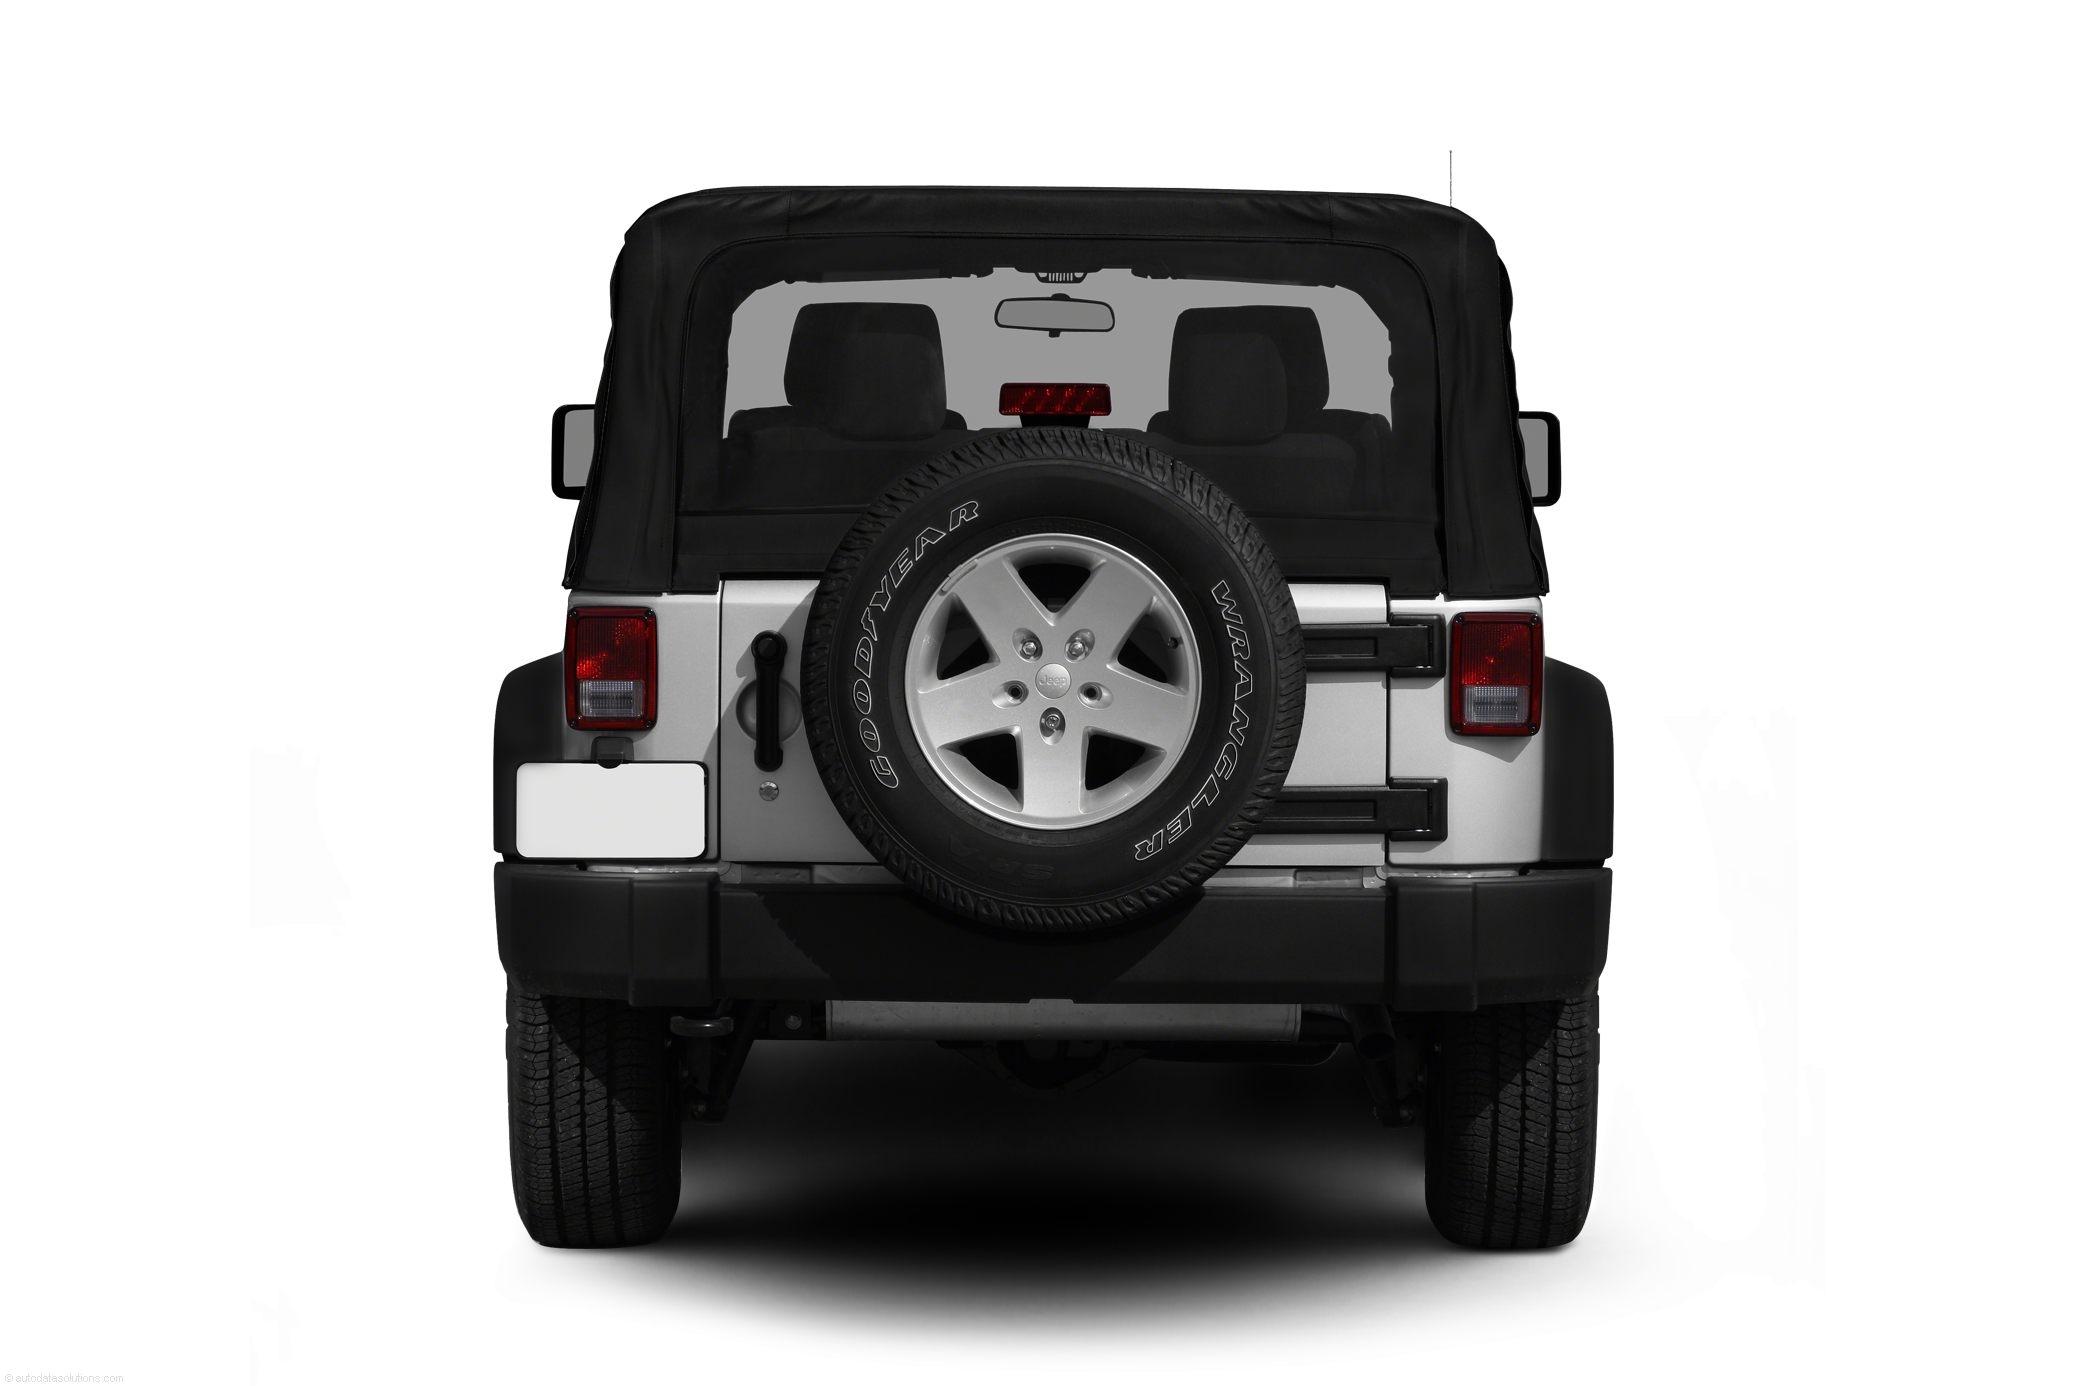 top rubicon invoice price black amp white images for pinterest jeep wrangler invoice price 2014